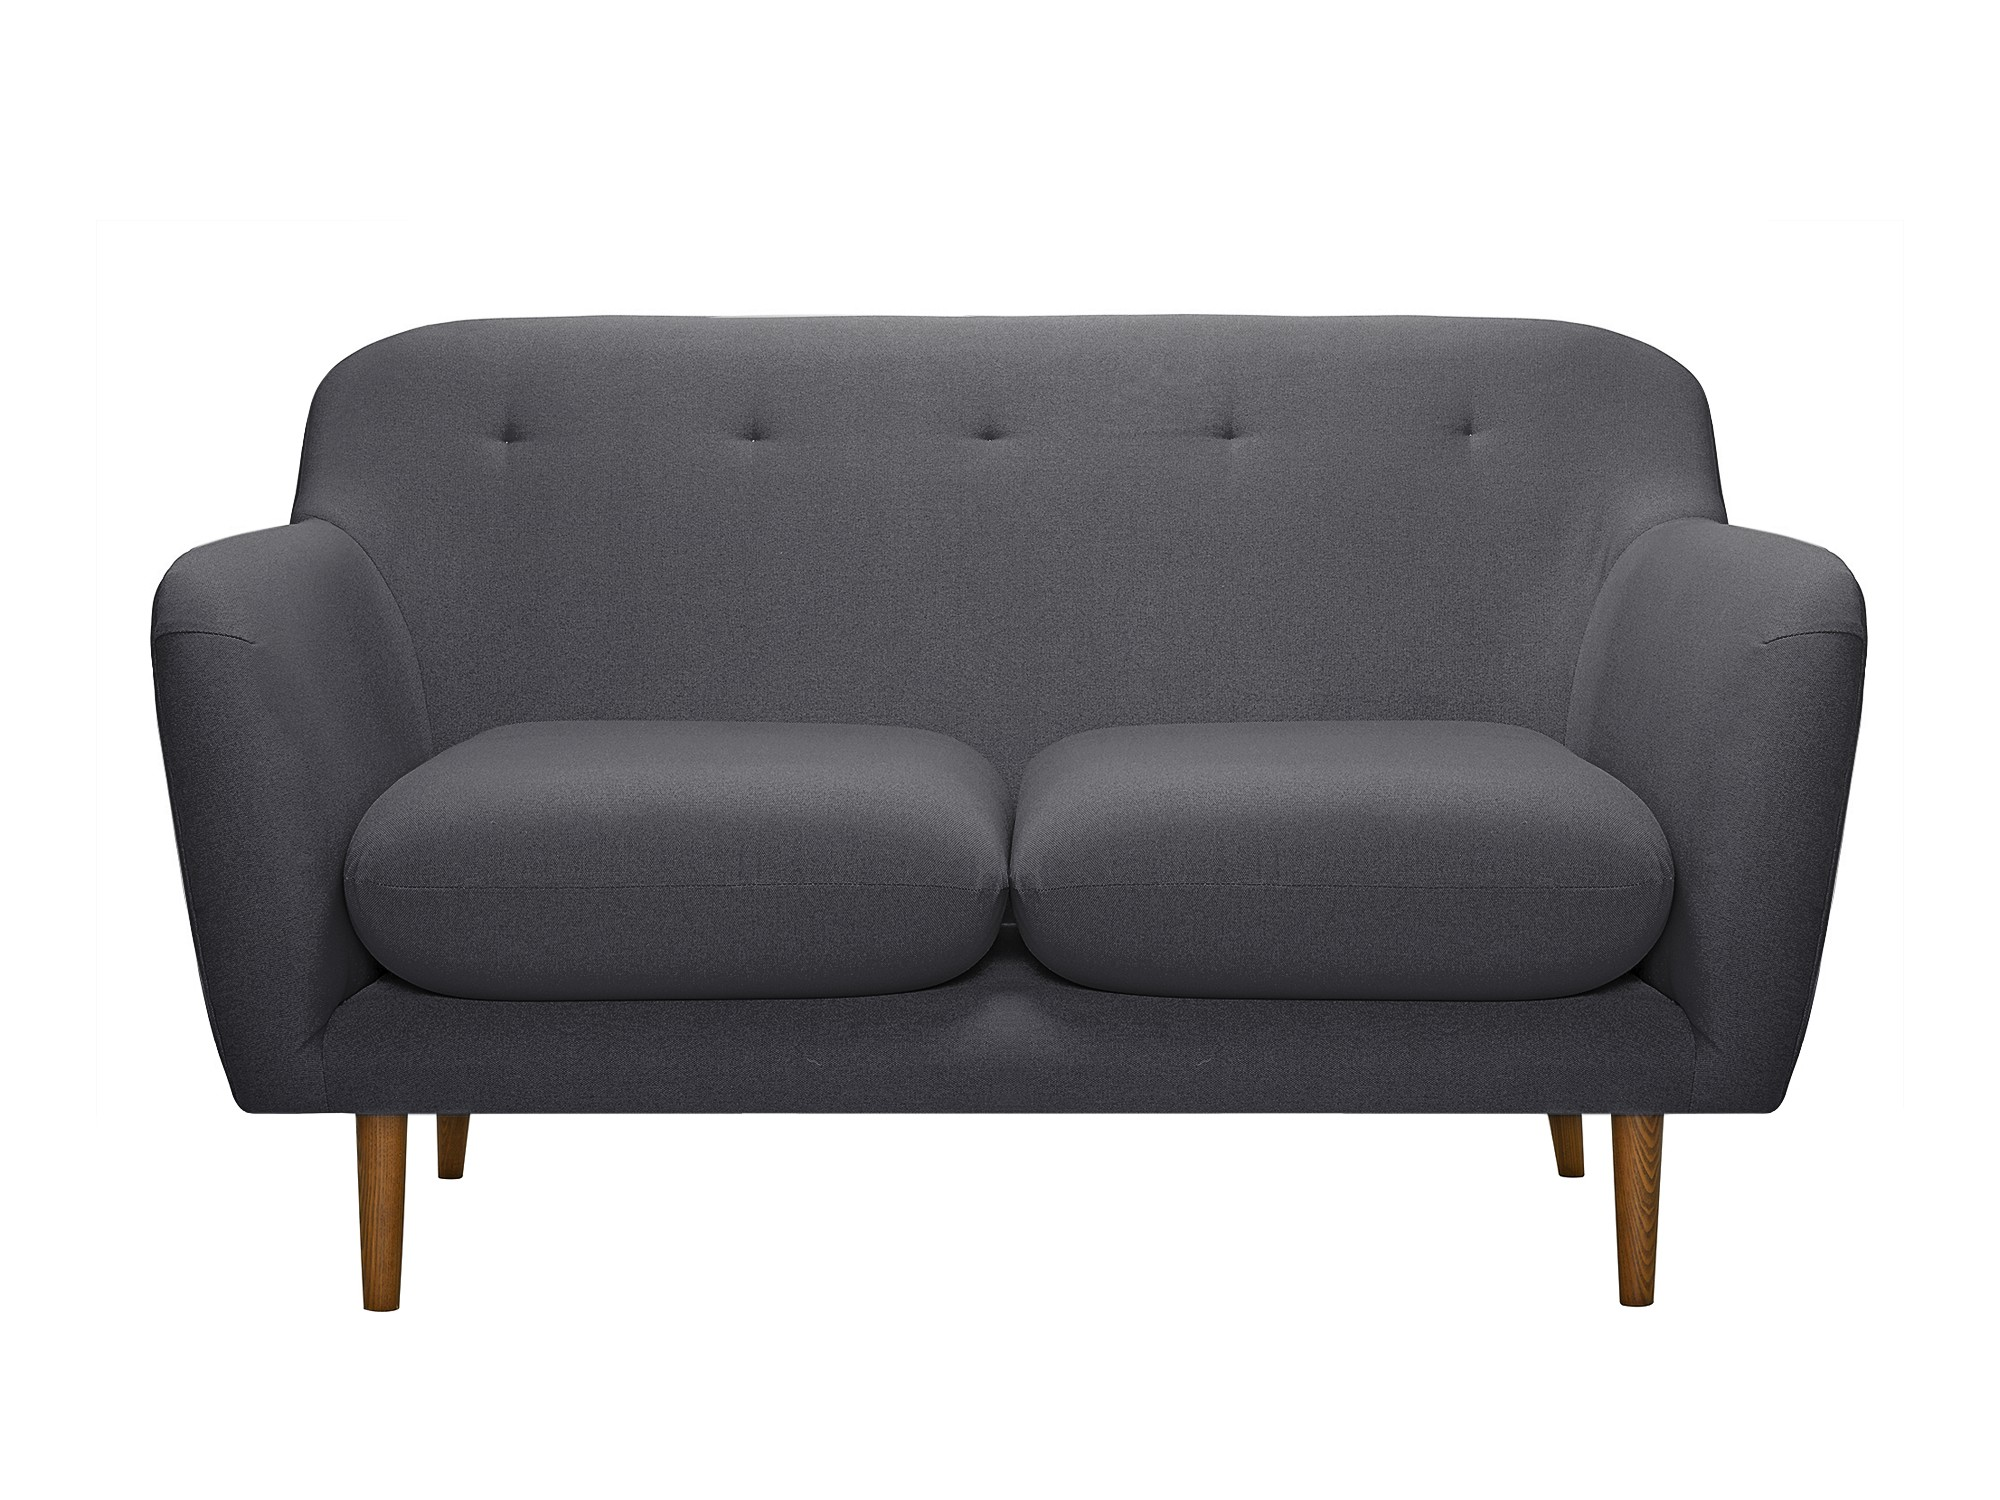 Myfurnish диван oslo серый  67893/1